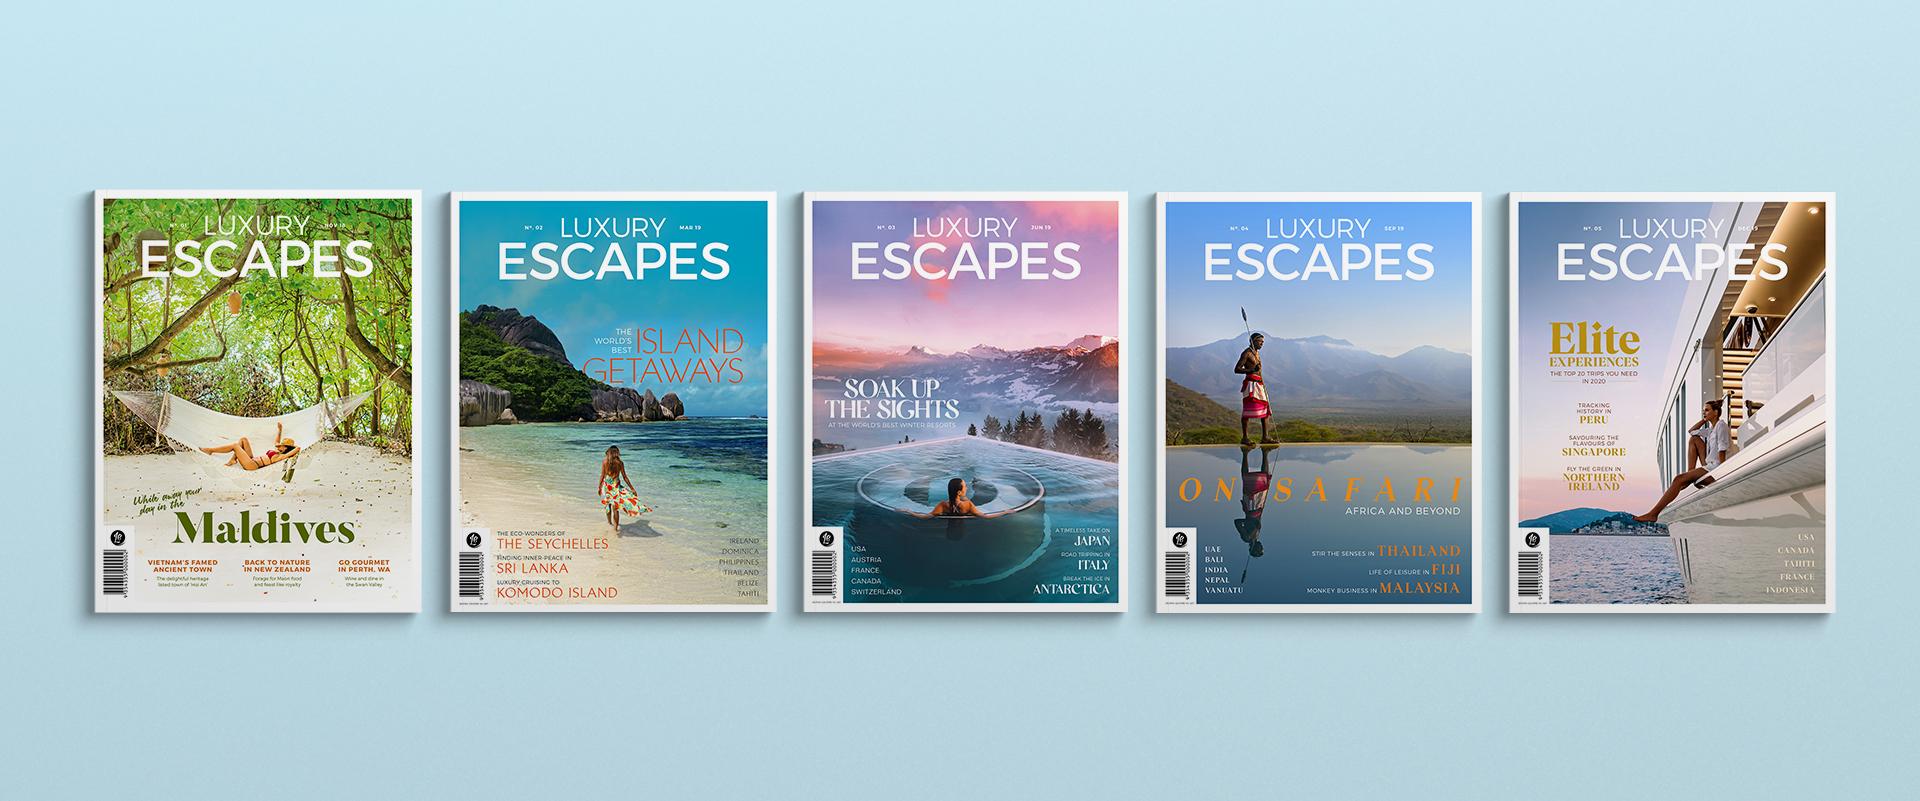 Luxury Escapes Travel Print Magazine